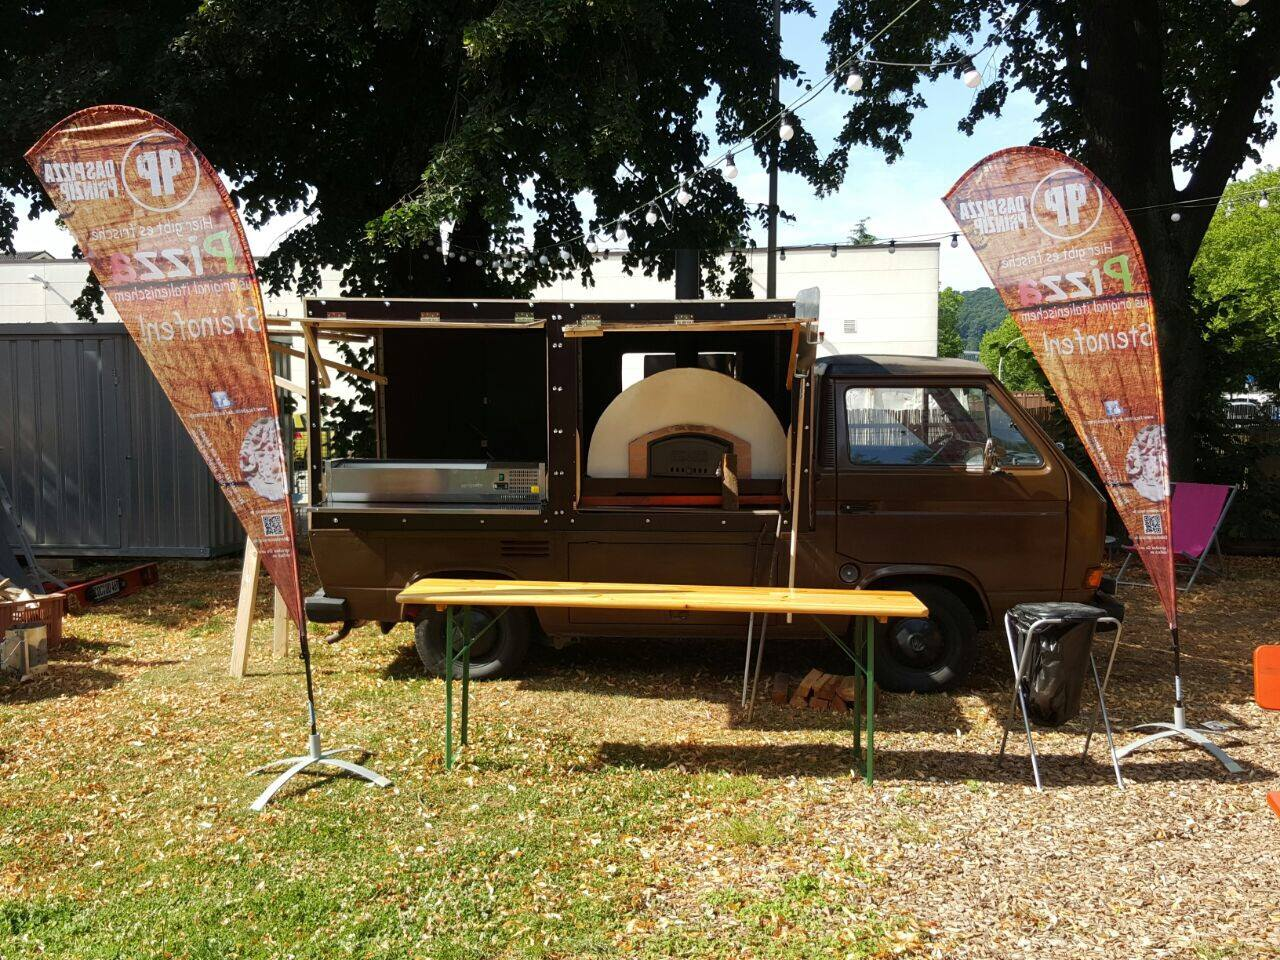 pizzaprinzip food truck wikia fandom powered by wikia. Black Bedroom Furniture Sets. Home Design Ideas